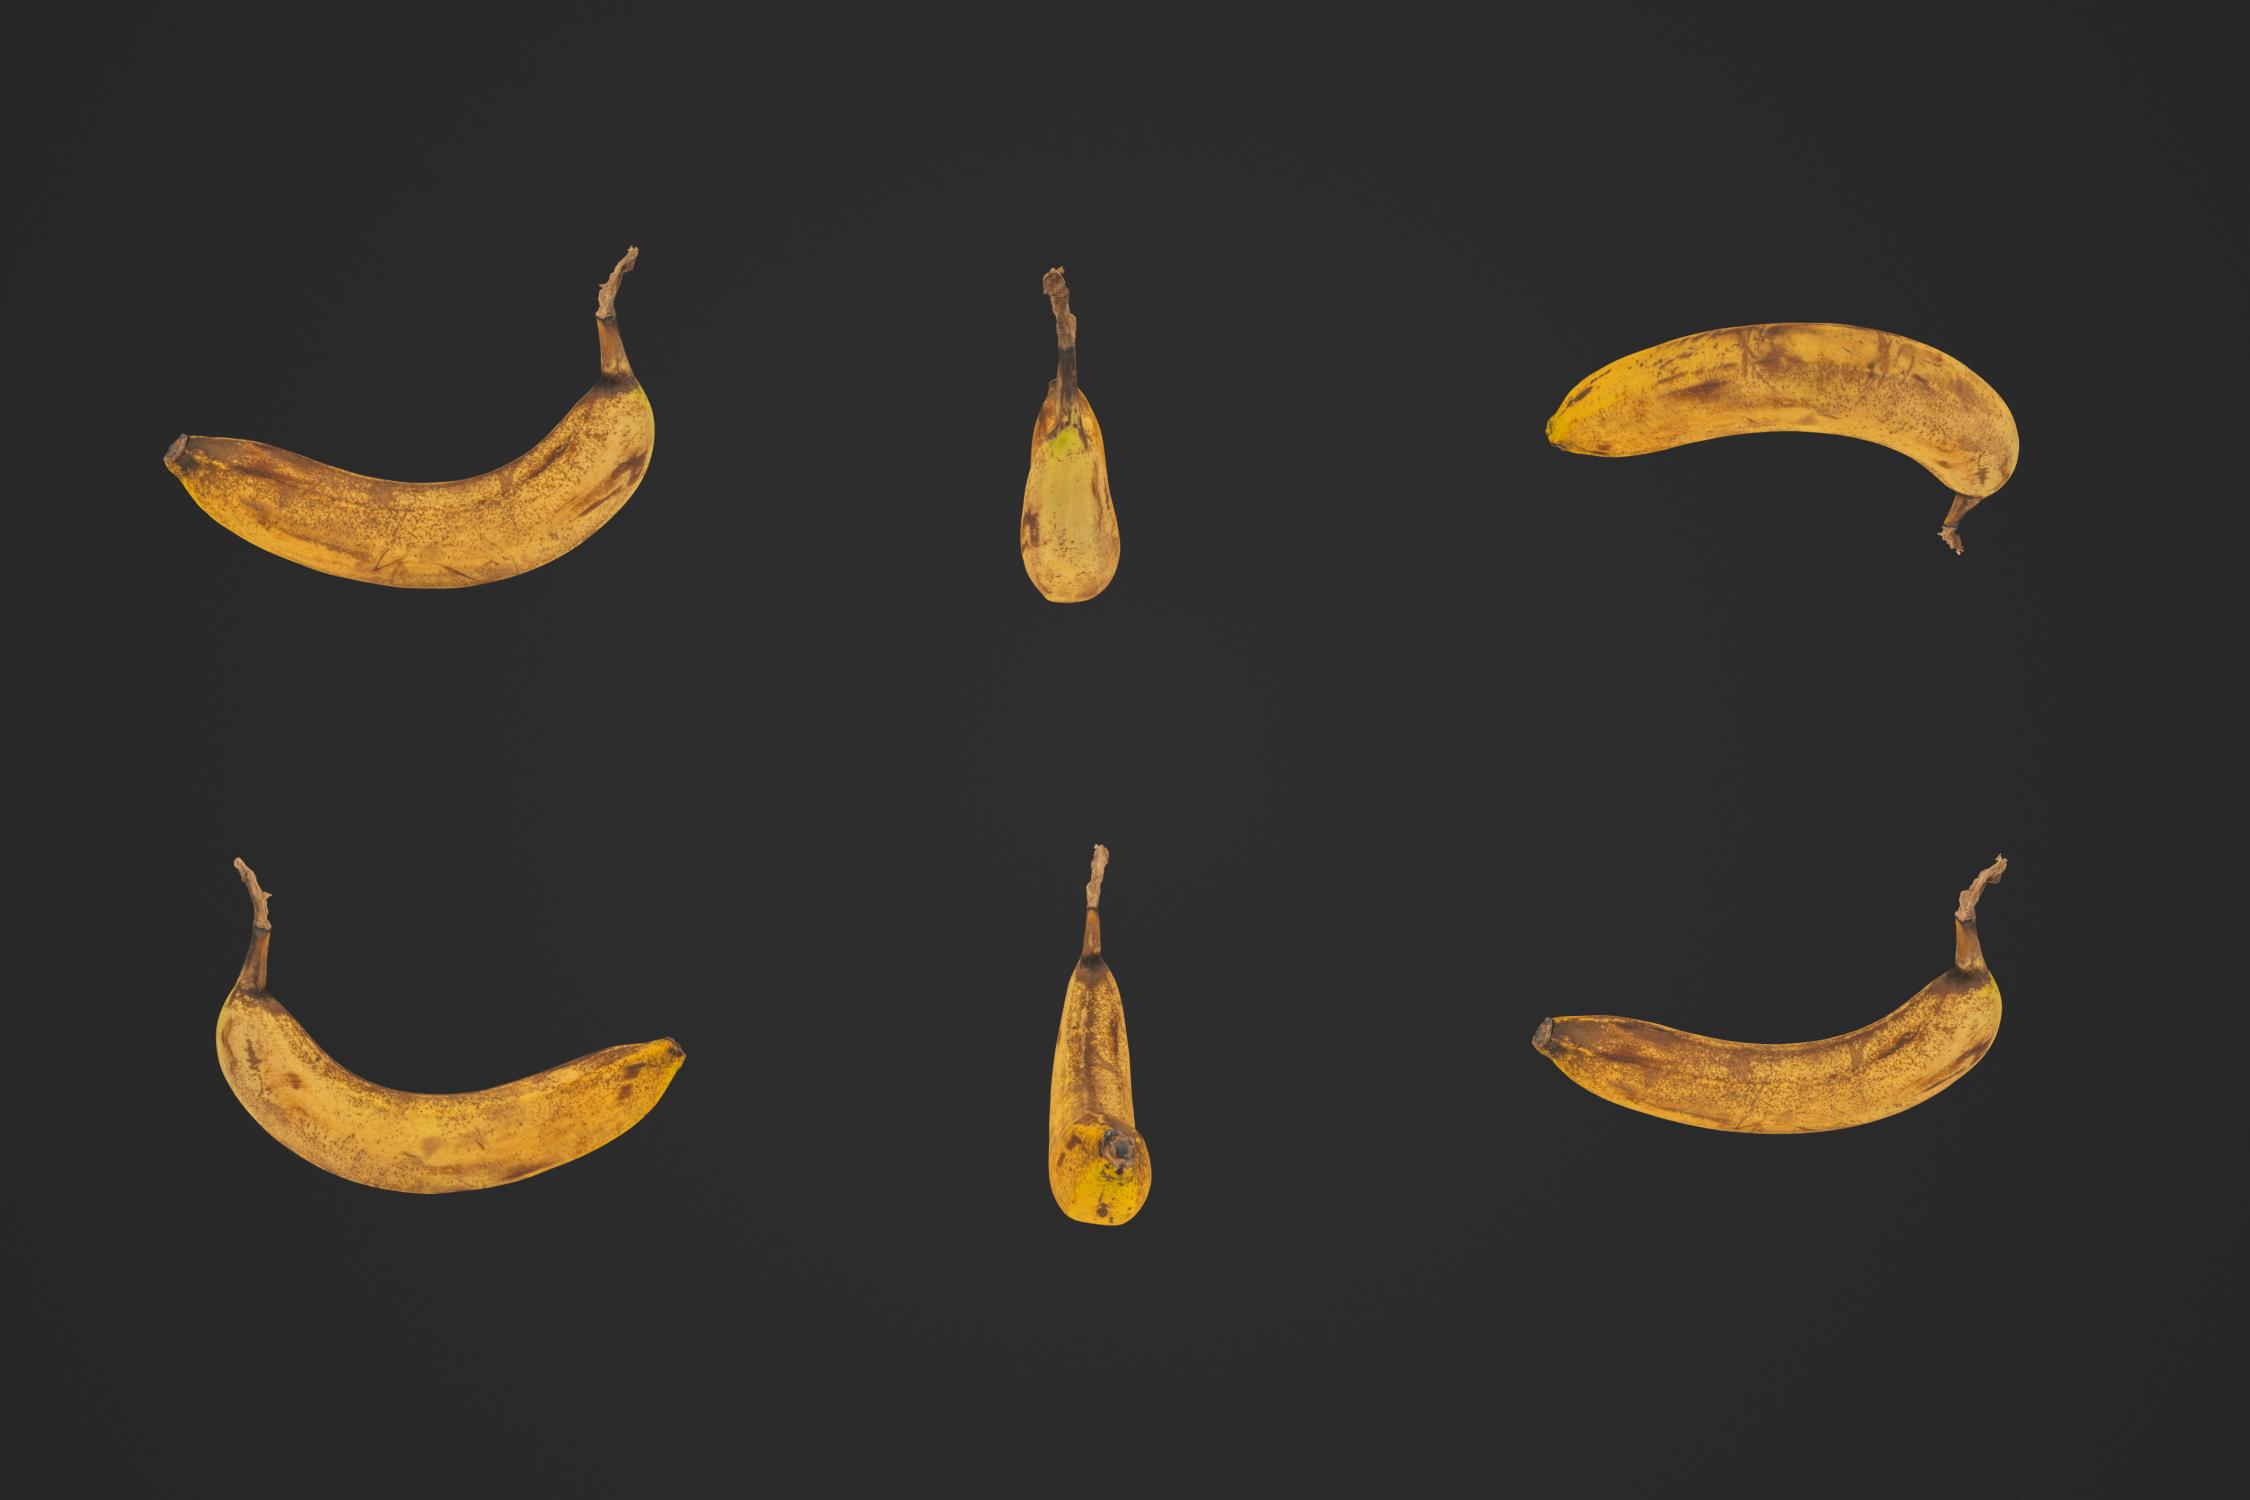 Unripe_Banana_1_1.jpg